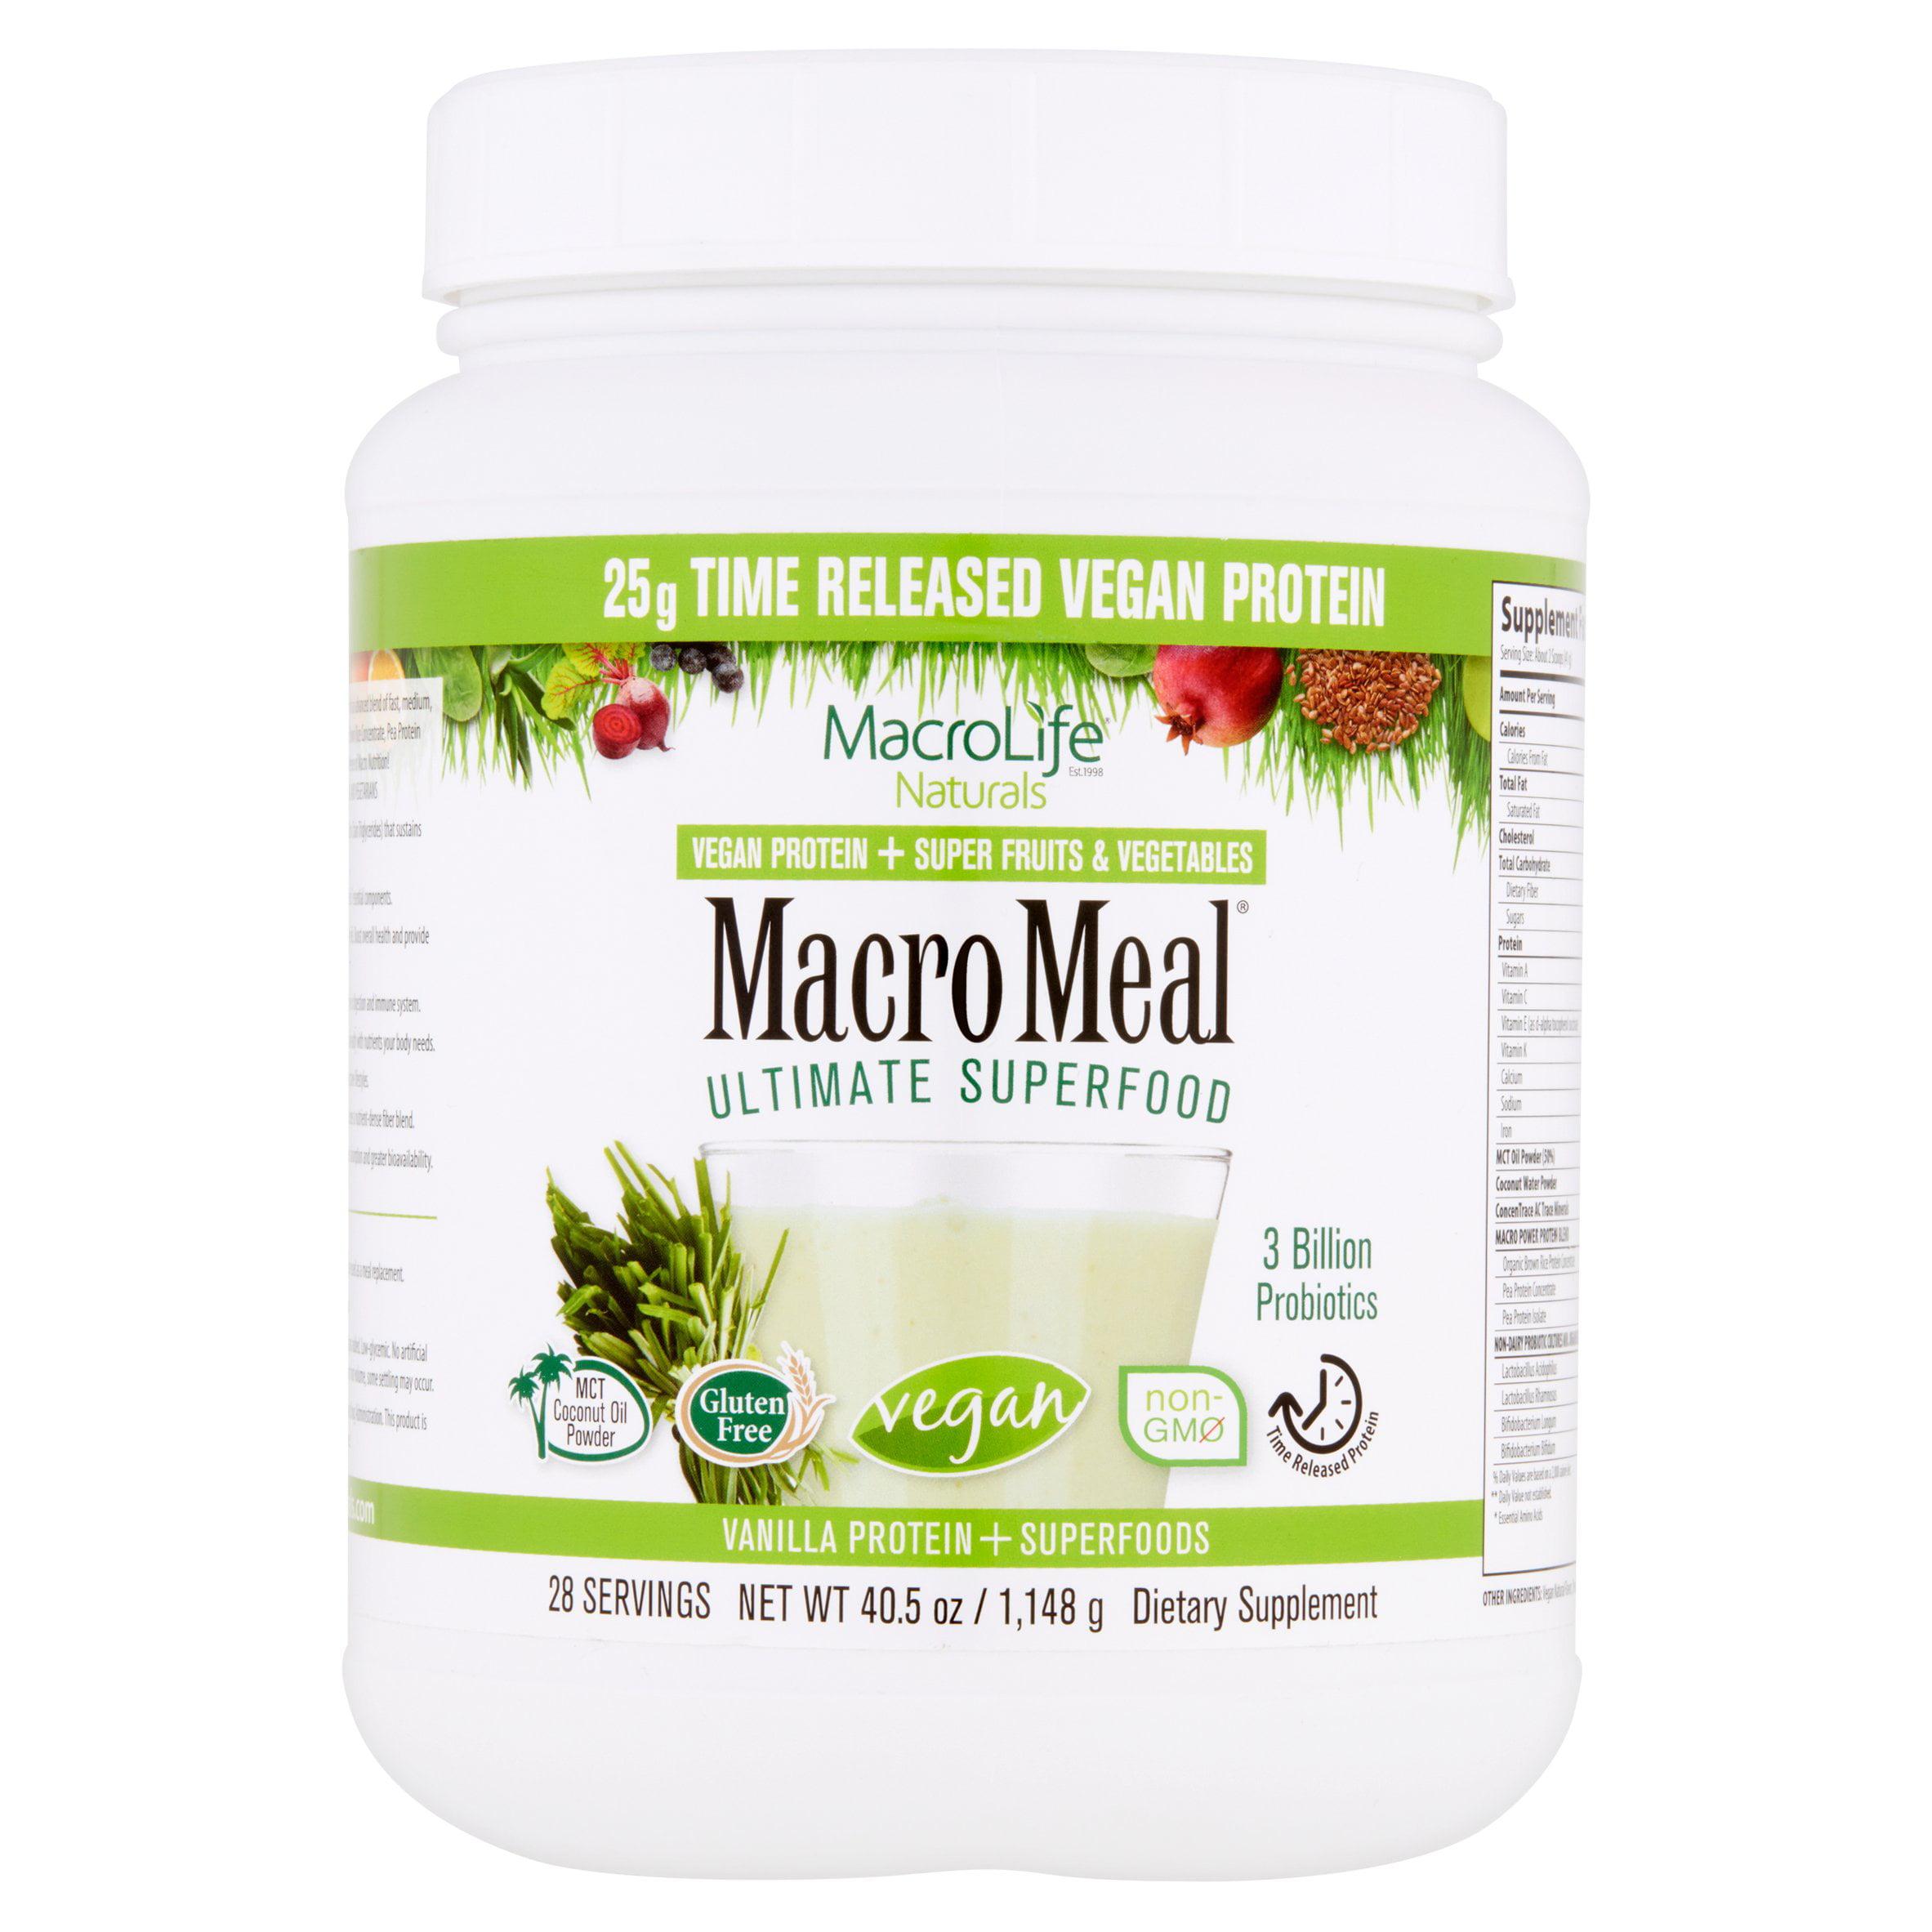 MacroLife Naturals MacroMeal Vegan Protein & Superfood Powder, Vanilla, 2.5 Lb